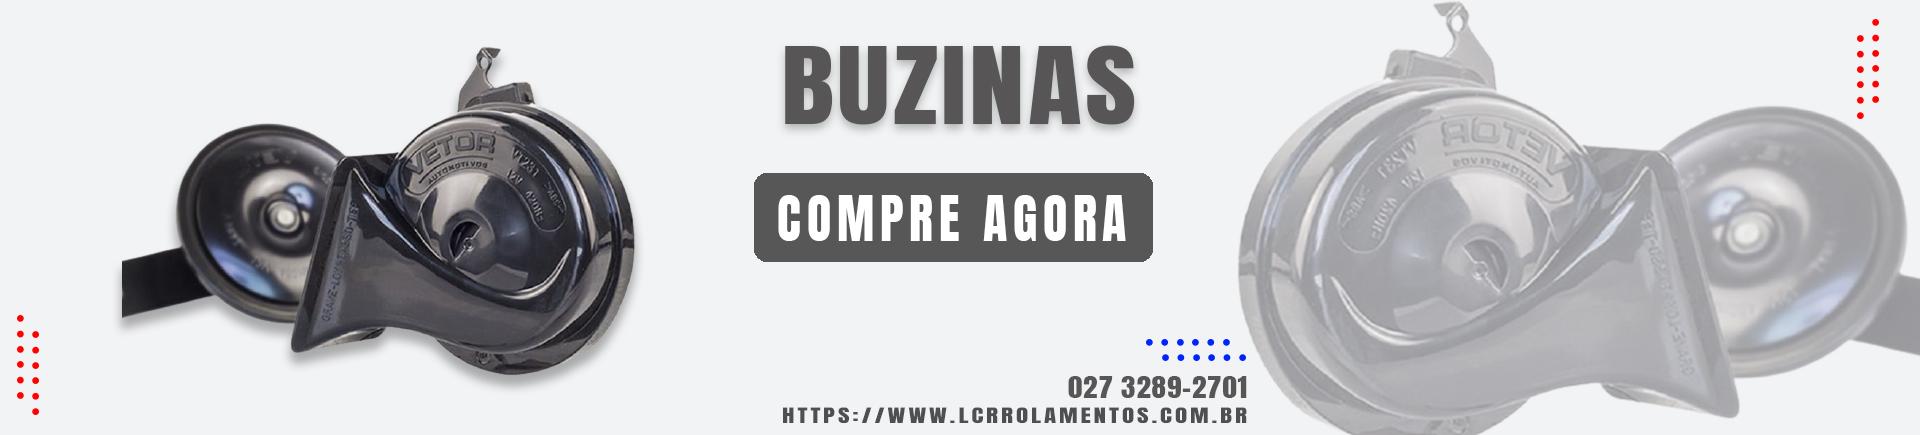 Buzinas_2